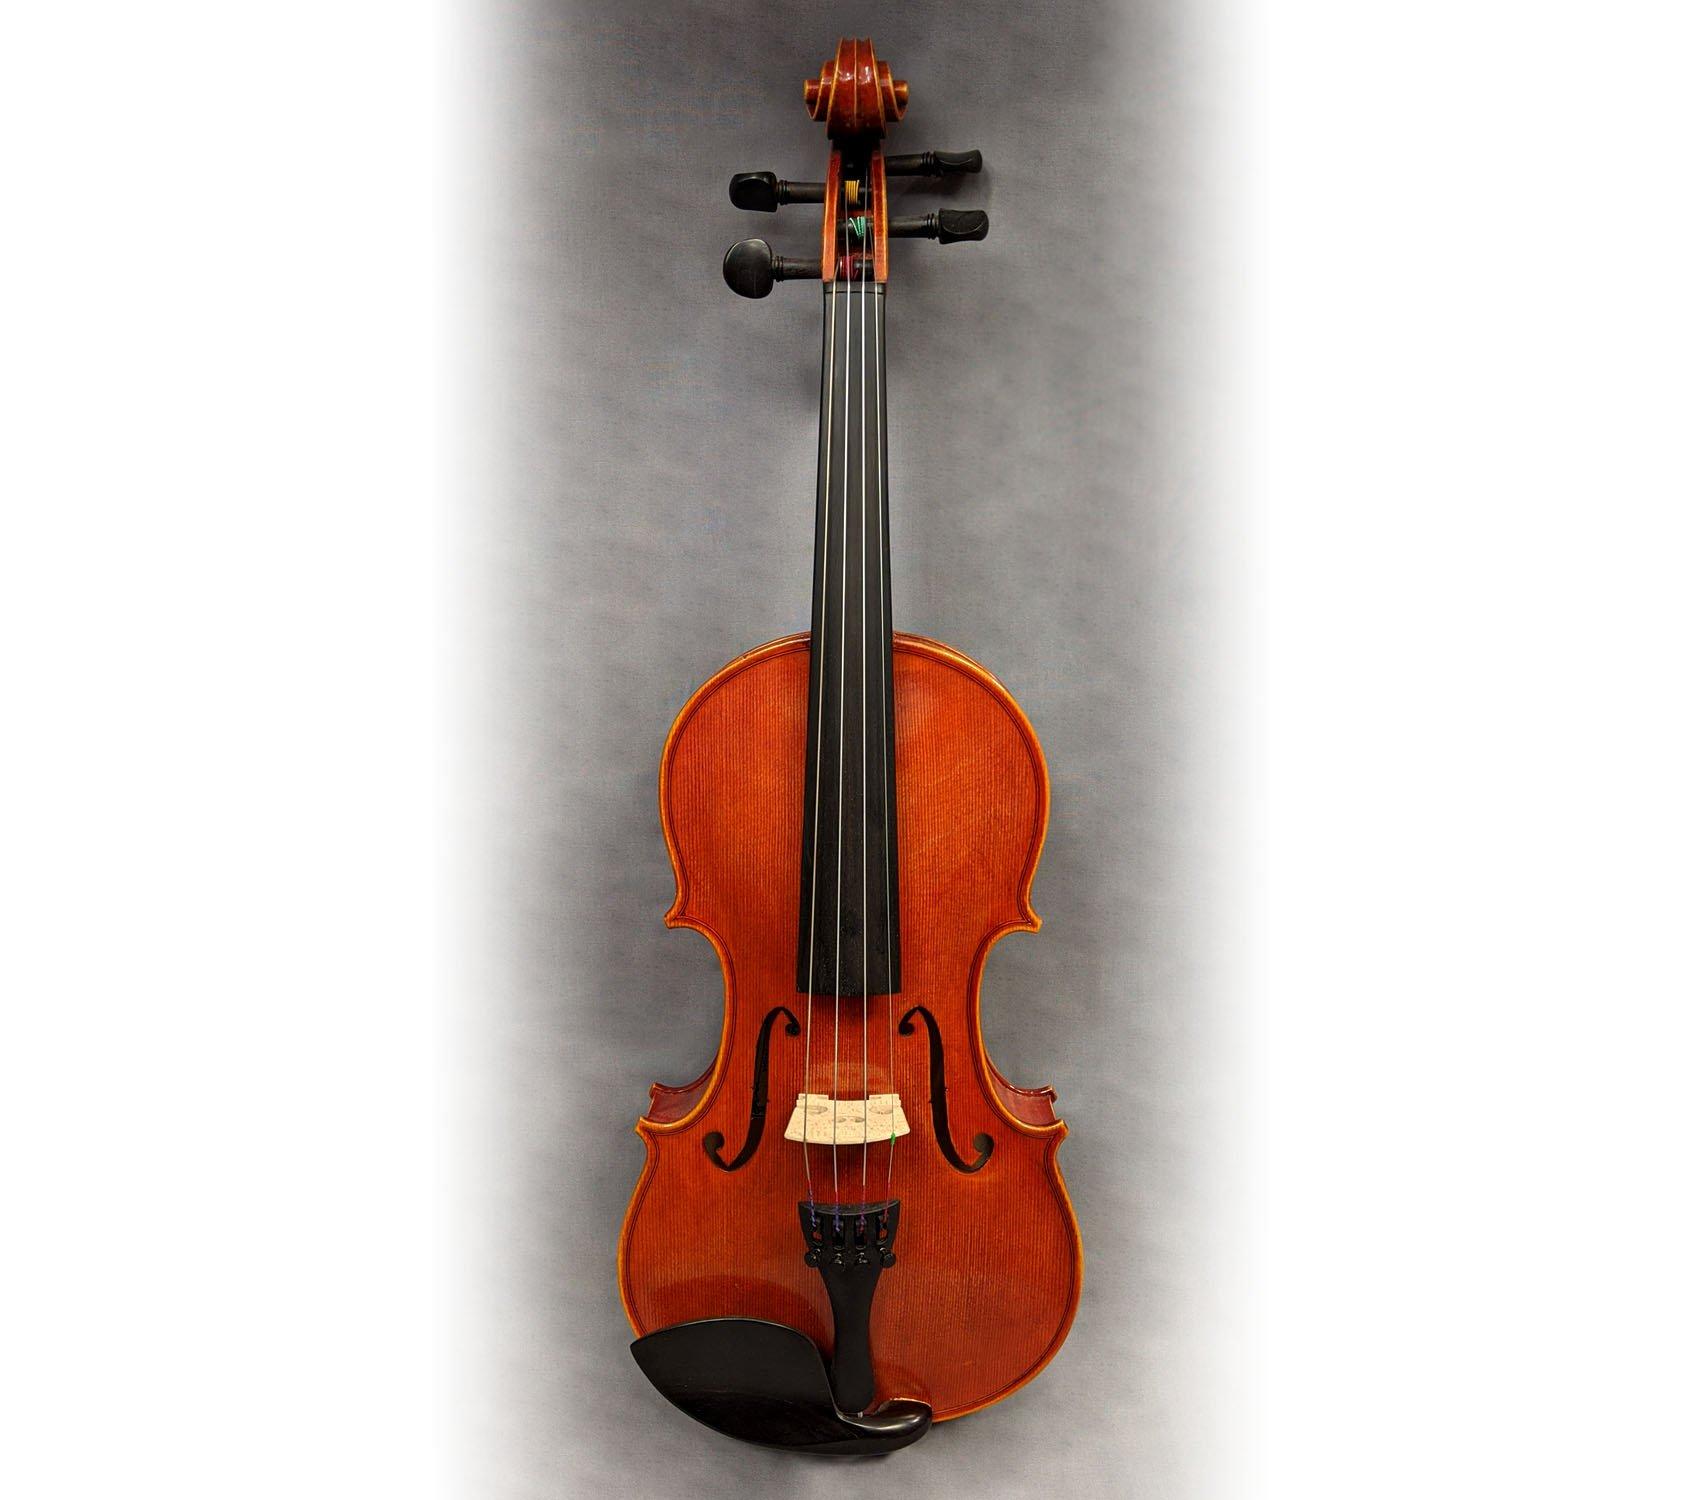 Pavia VN264 4/4 Violin Outfit